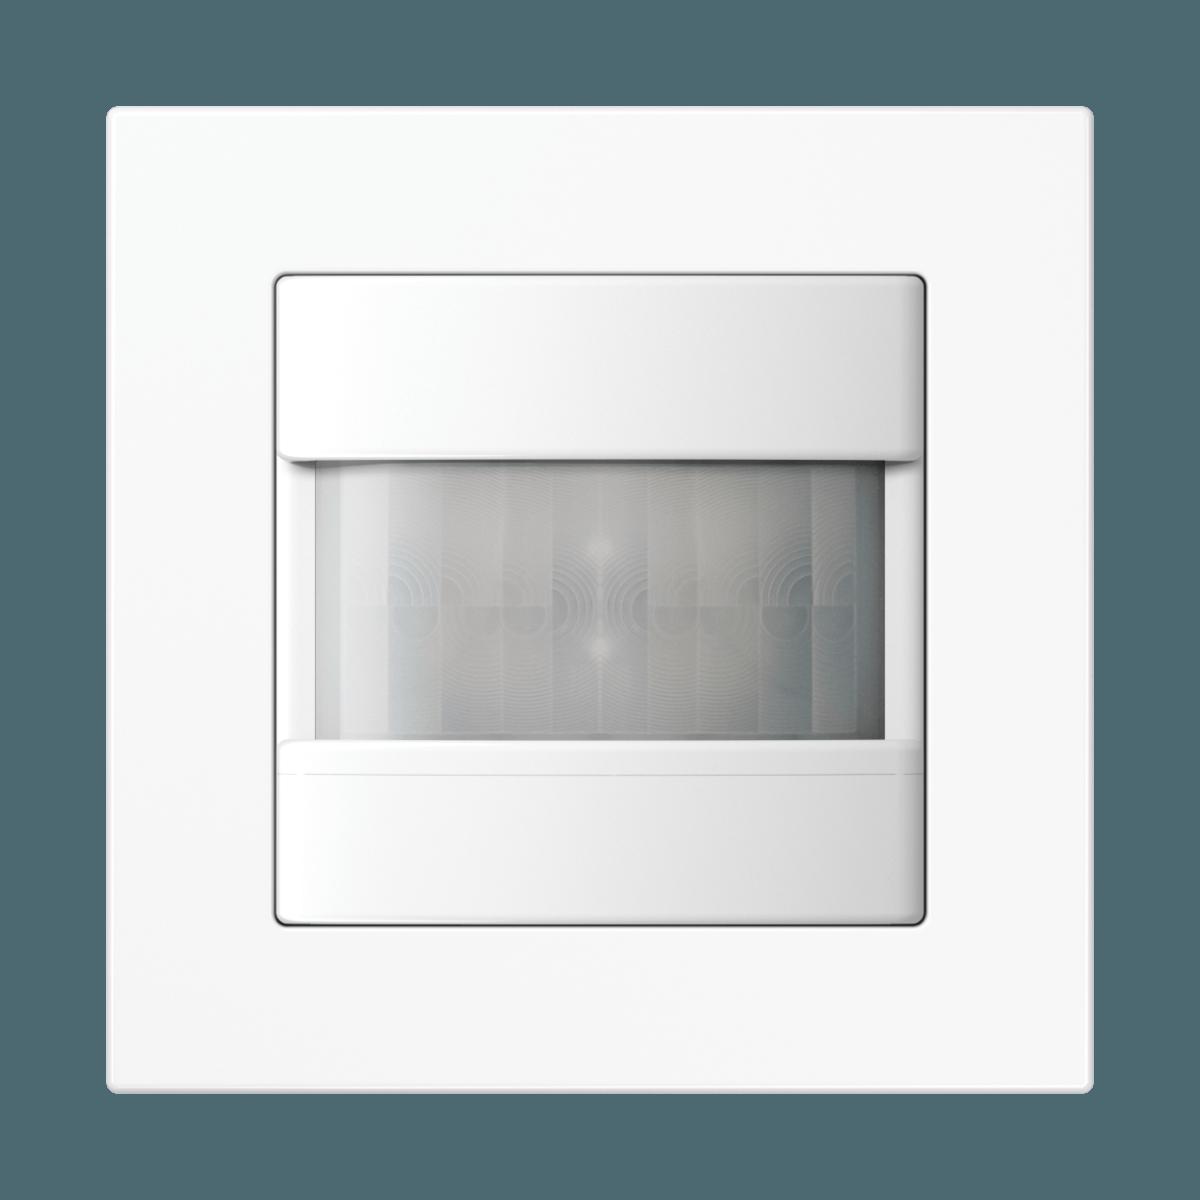 Variasi A 550 White Series  LightingInterior LightingLighting Components 2